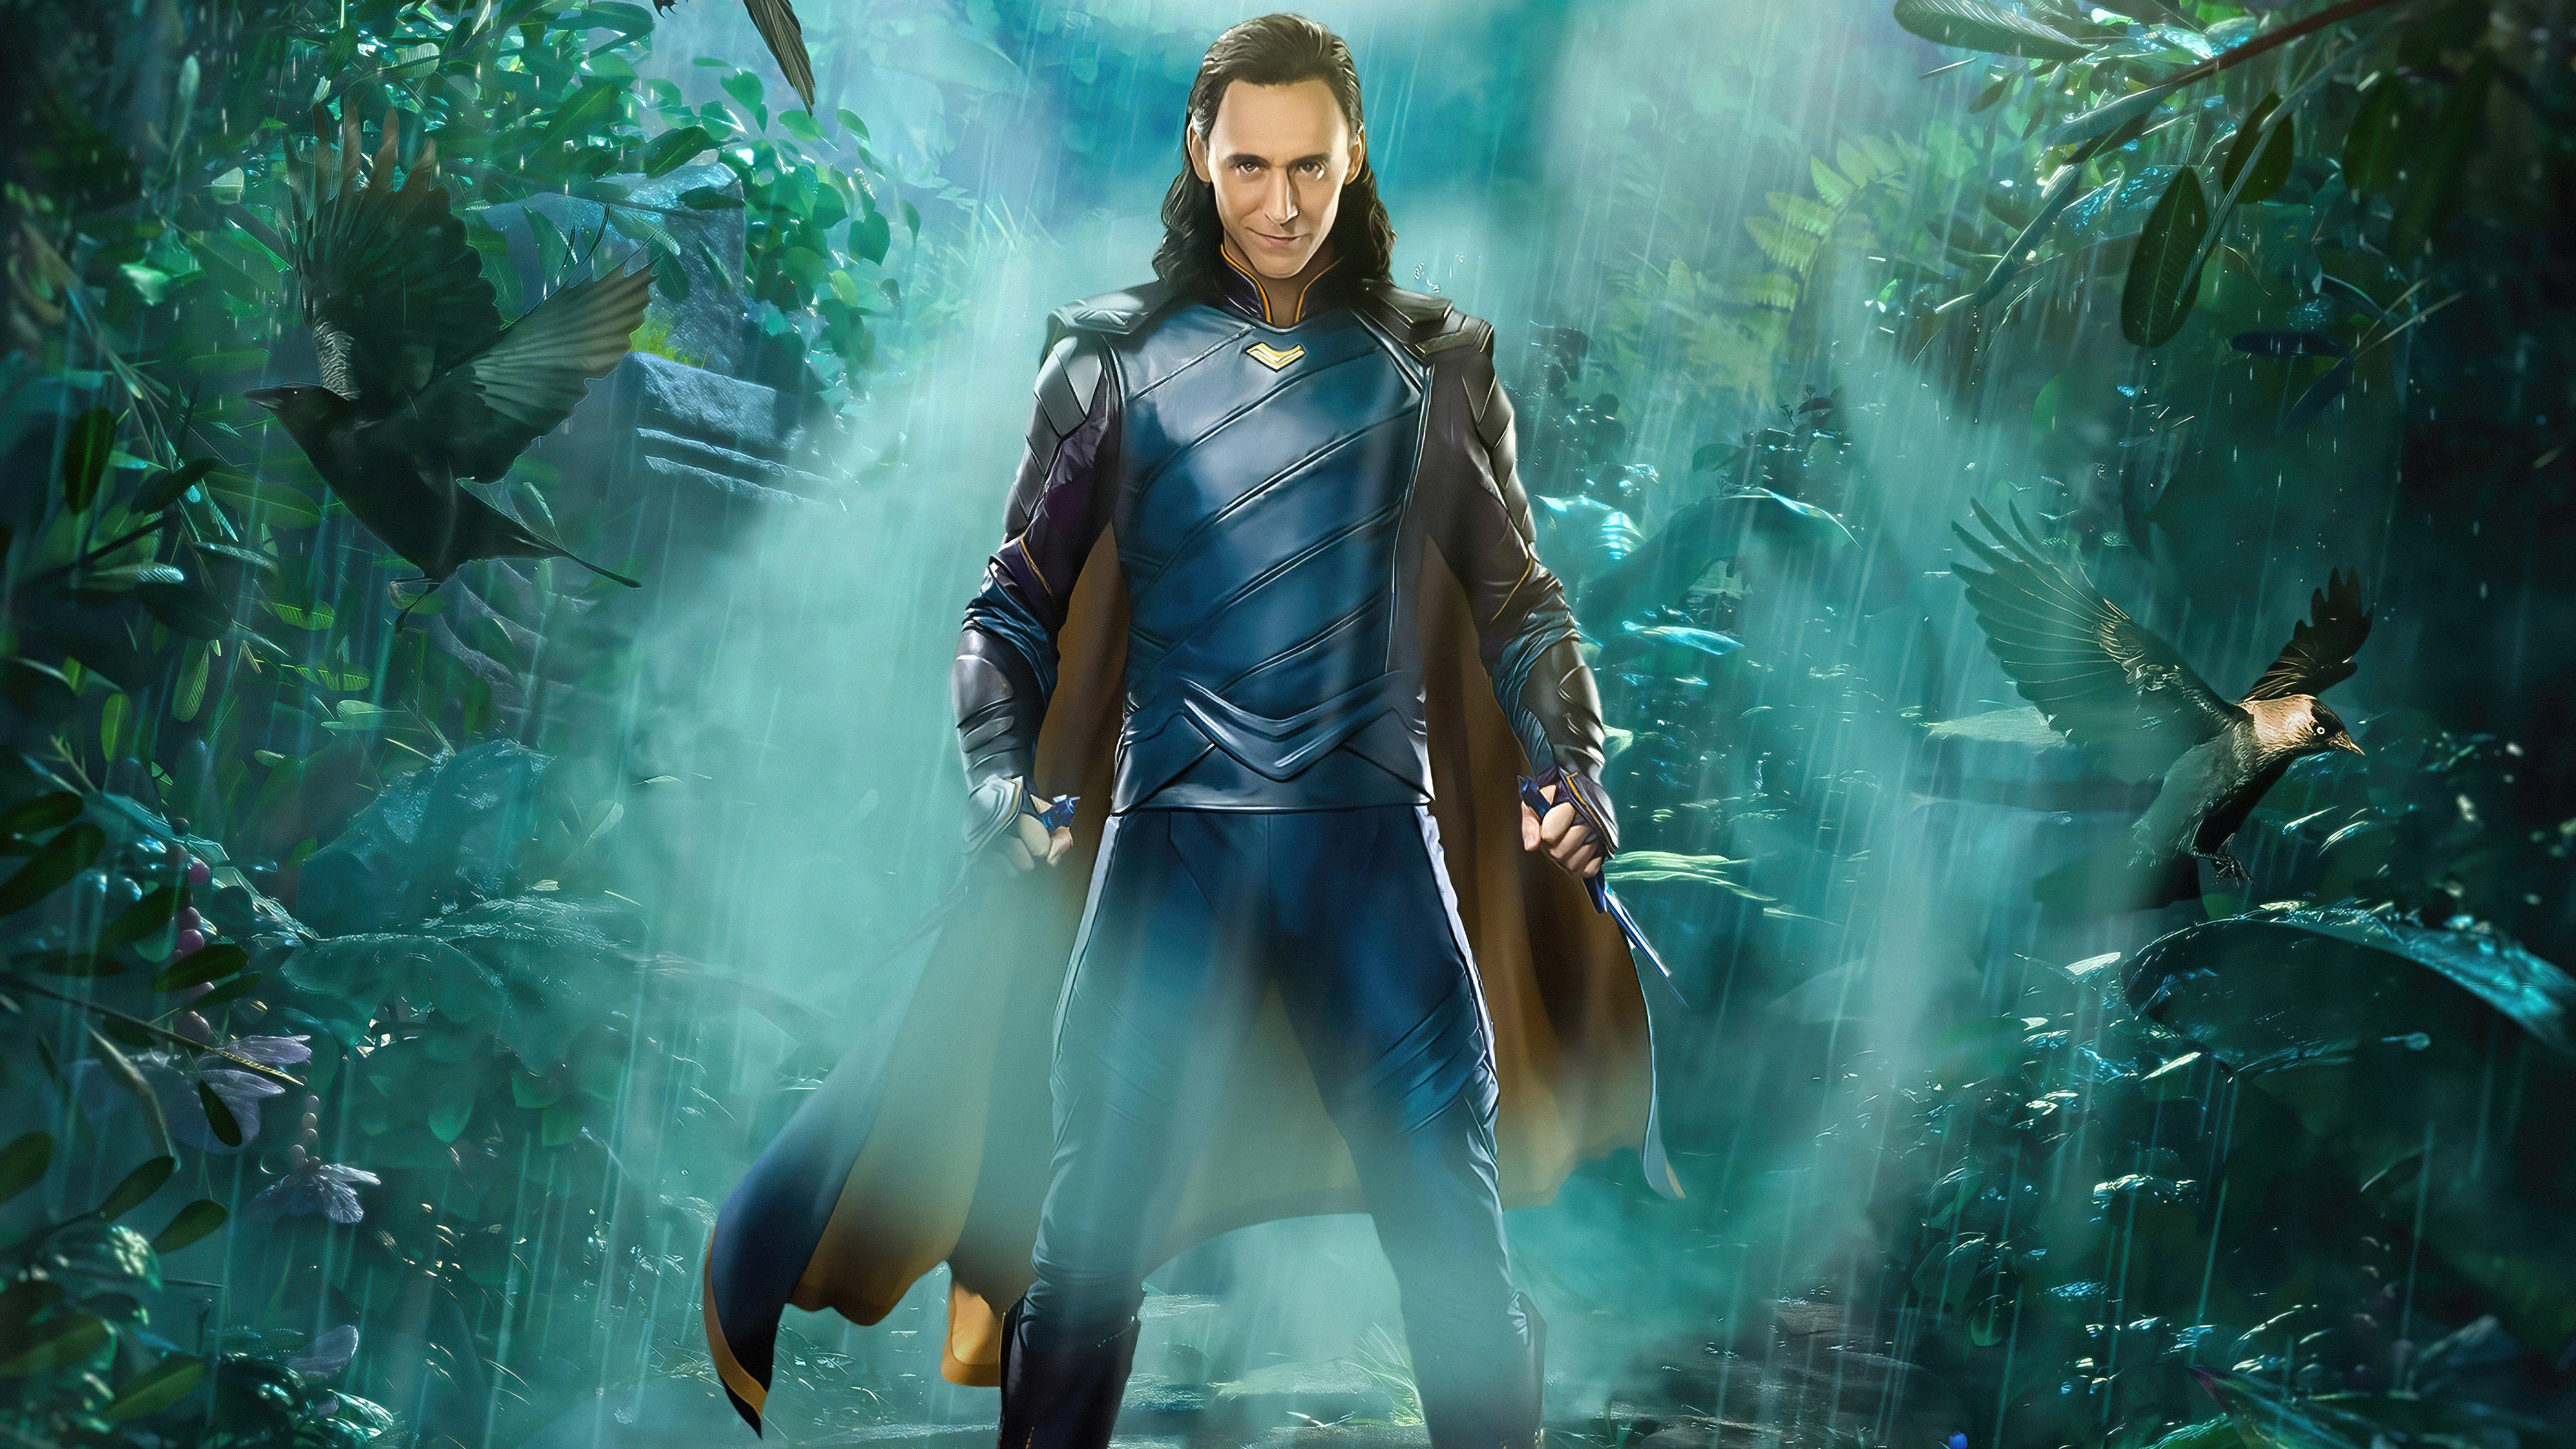 Wallpaper Loki Where mischief lies